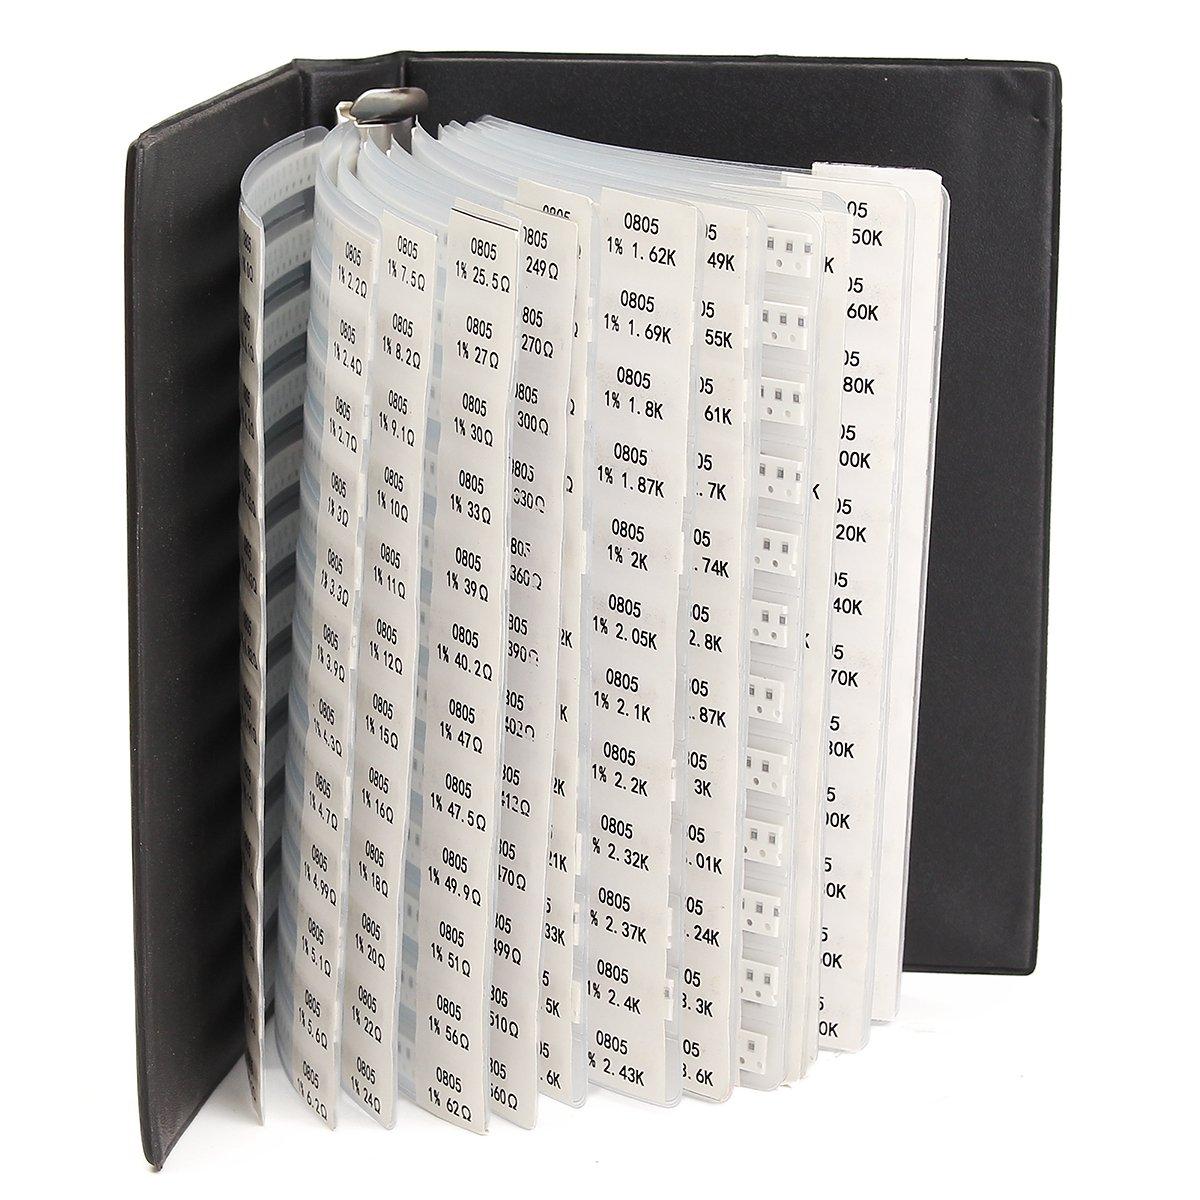 LaDicha 5525Pcs 221 Valores 0805 Resistores De Chip SMD 1/% 0-20M Surtido Kit Libro De Muestra